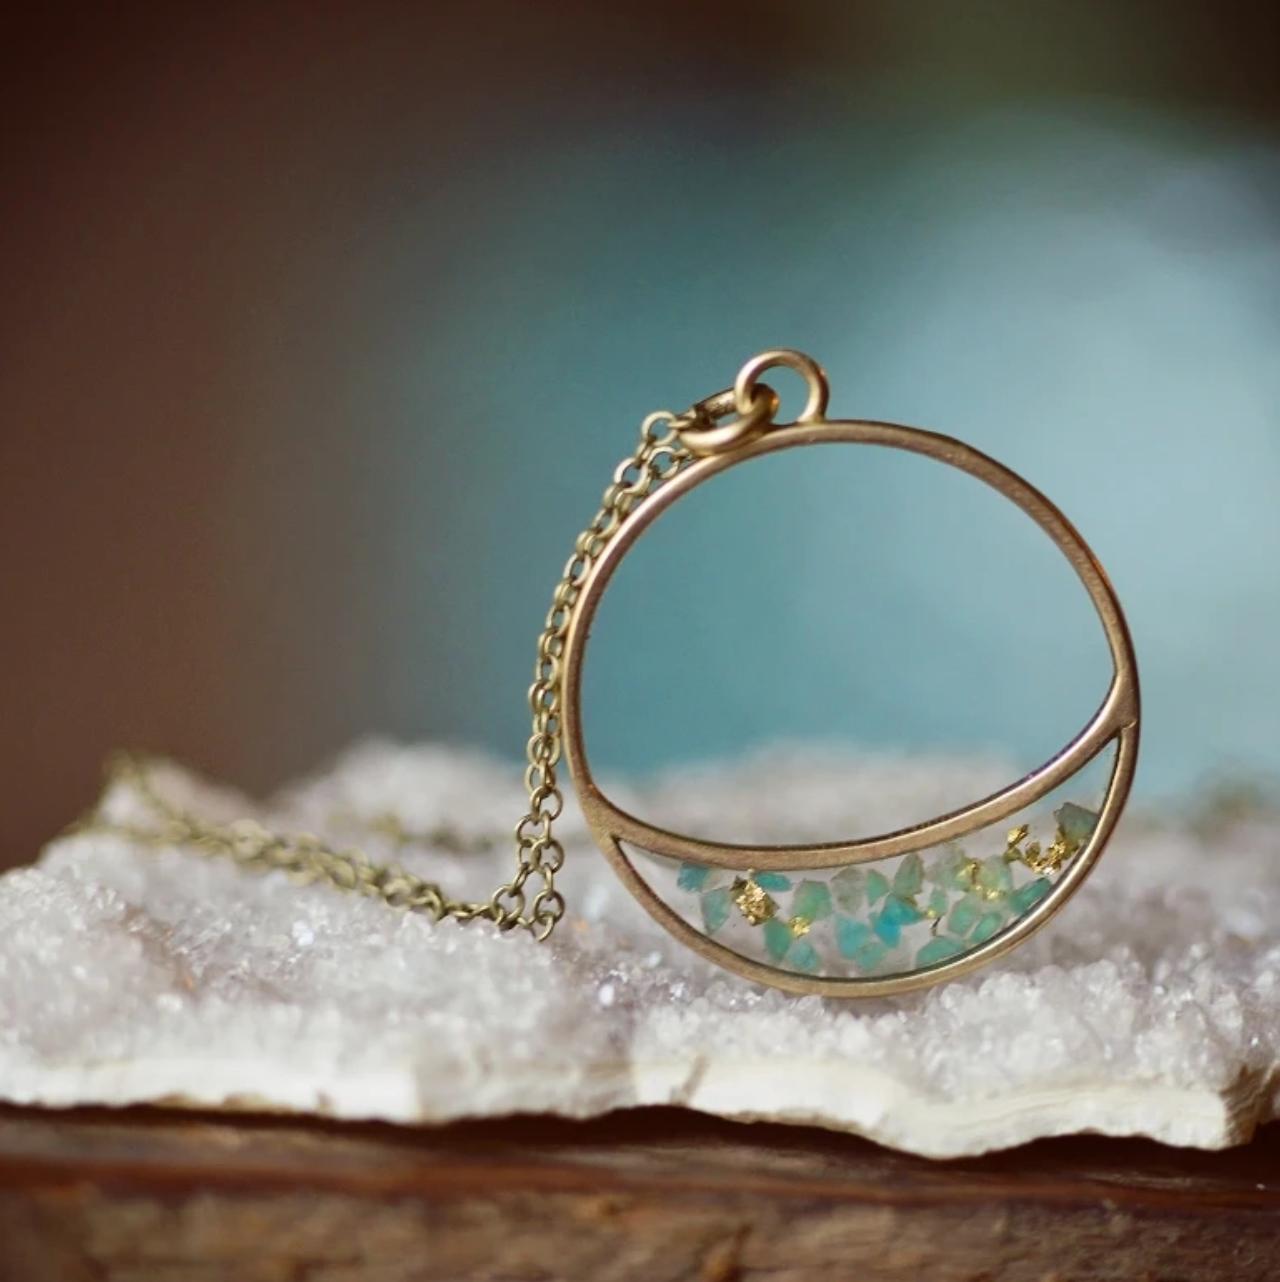 Cameoko Long Crescent Necklace-AMAZONITE + GOLD LEAF